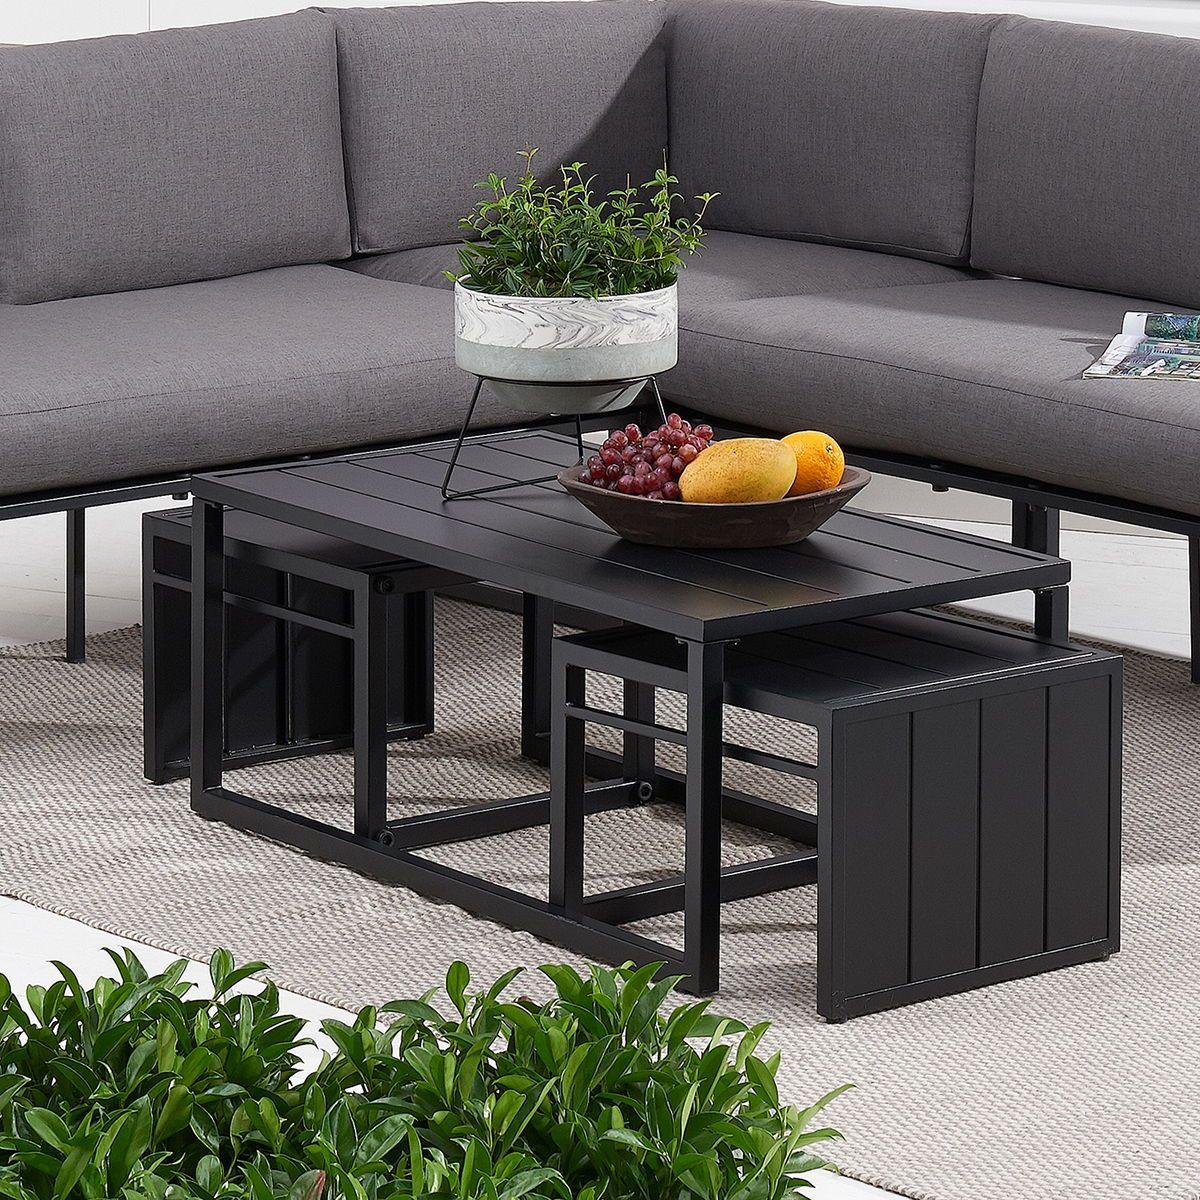 Patio Garden Nesting Tables Outdoor Furniture Sets Better Homes Gardens